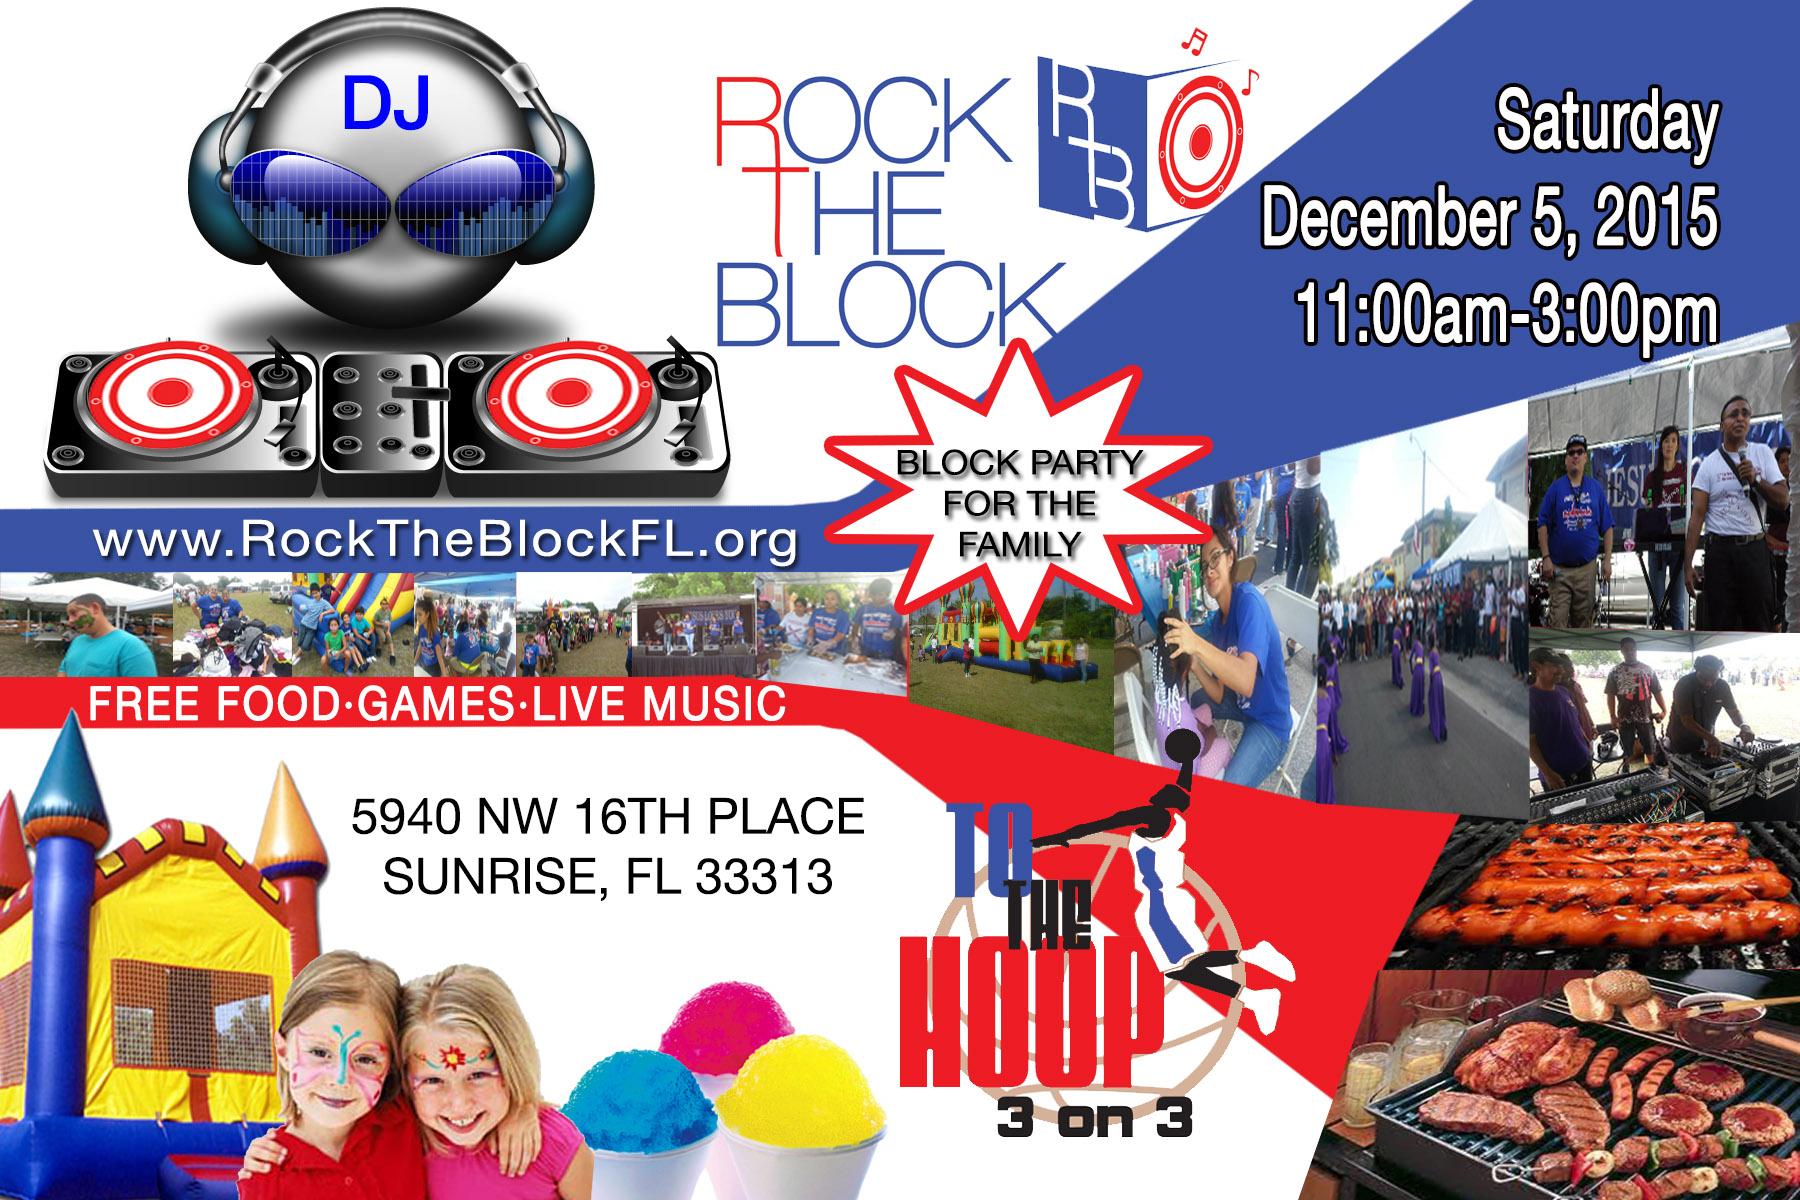 Rock The Block 2015